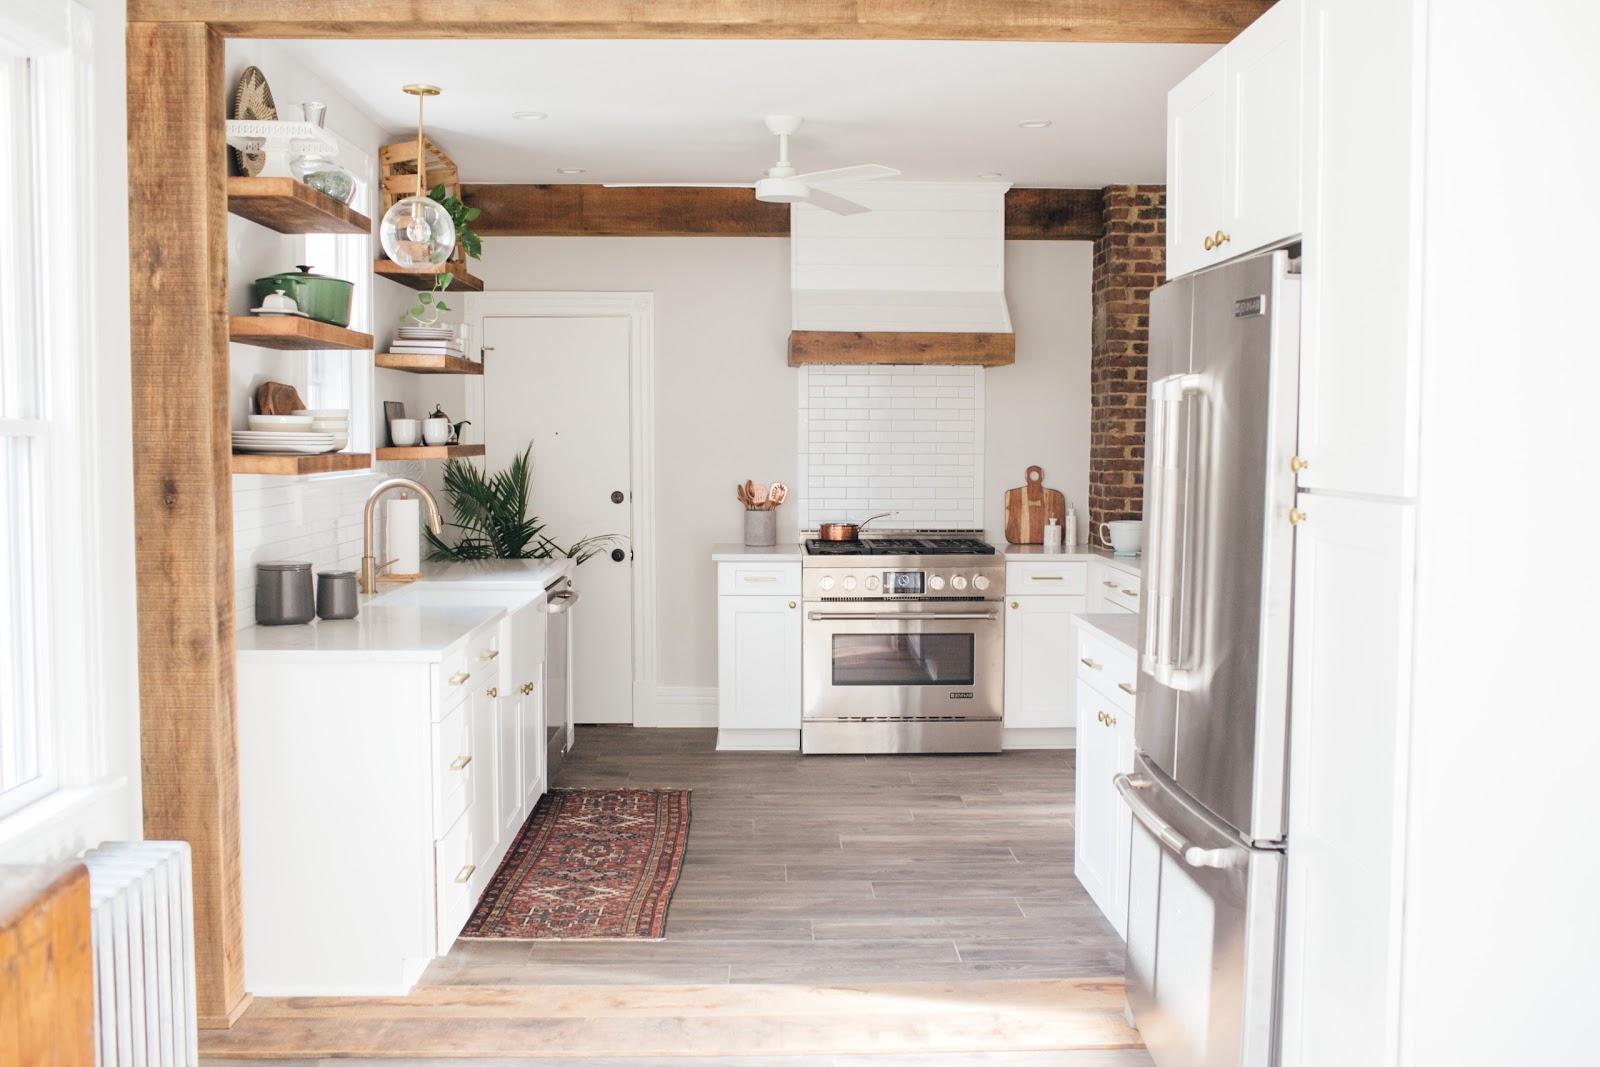 RENOVATION REVEAL: South Street Kitchen